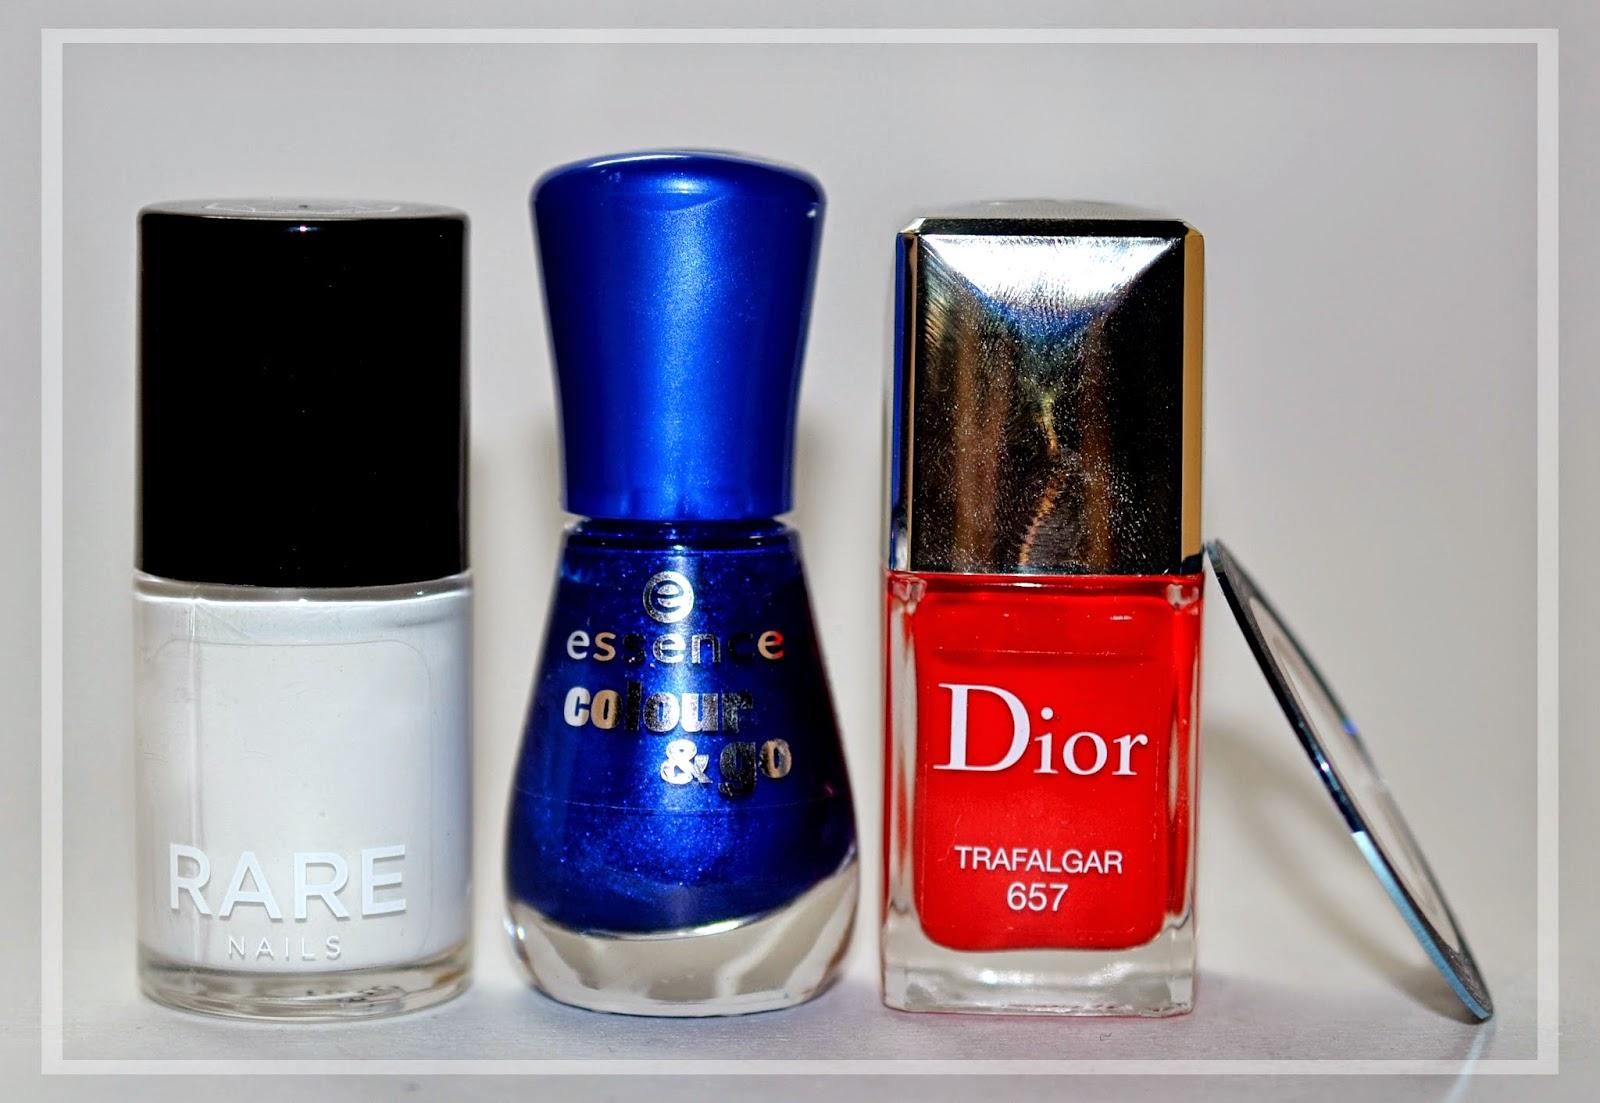 Nail nails nailart art uñas diseño uñas rare milk essence dior trafalgar 657